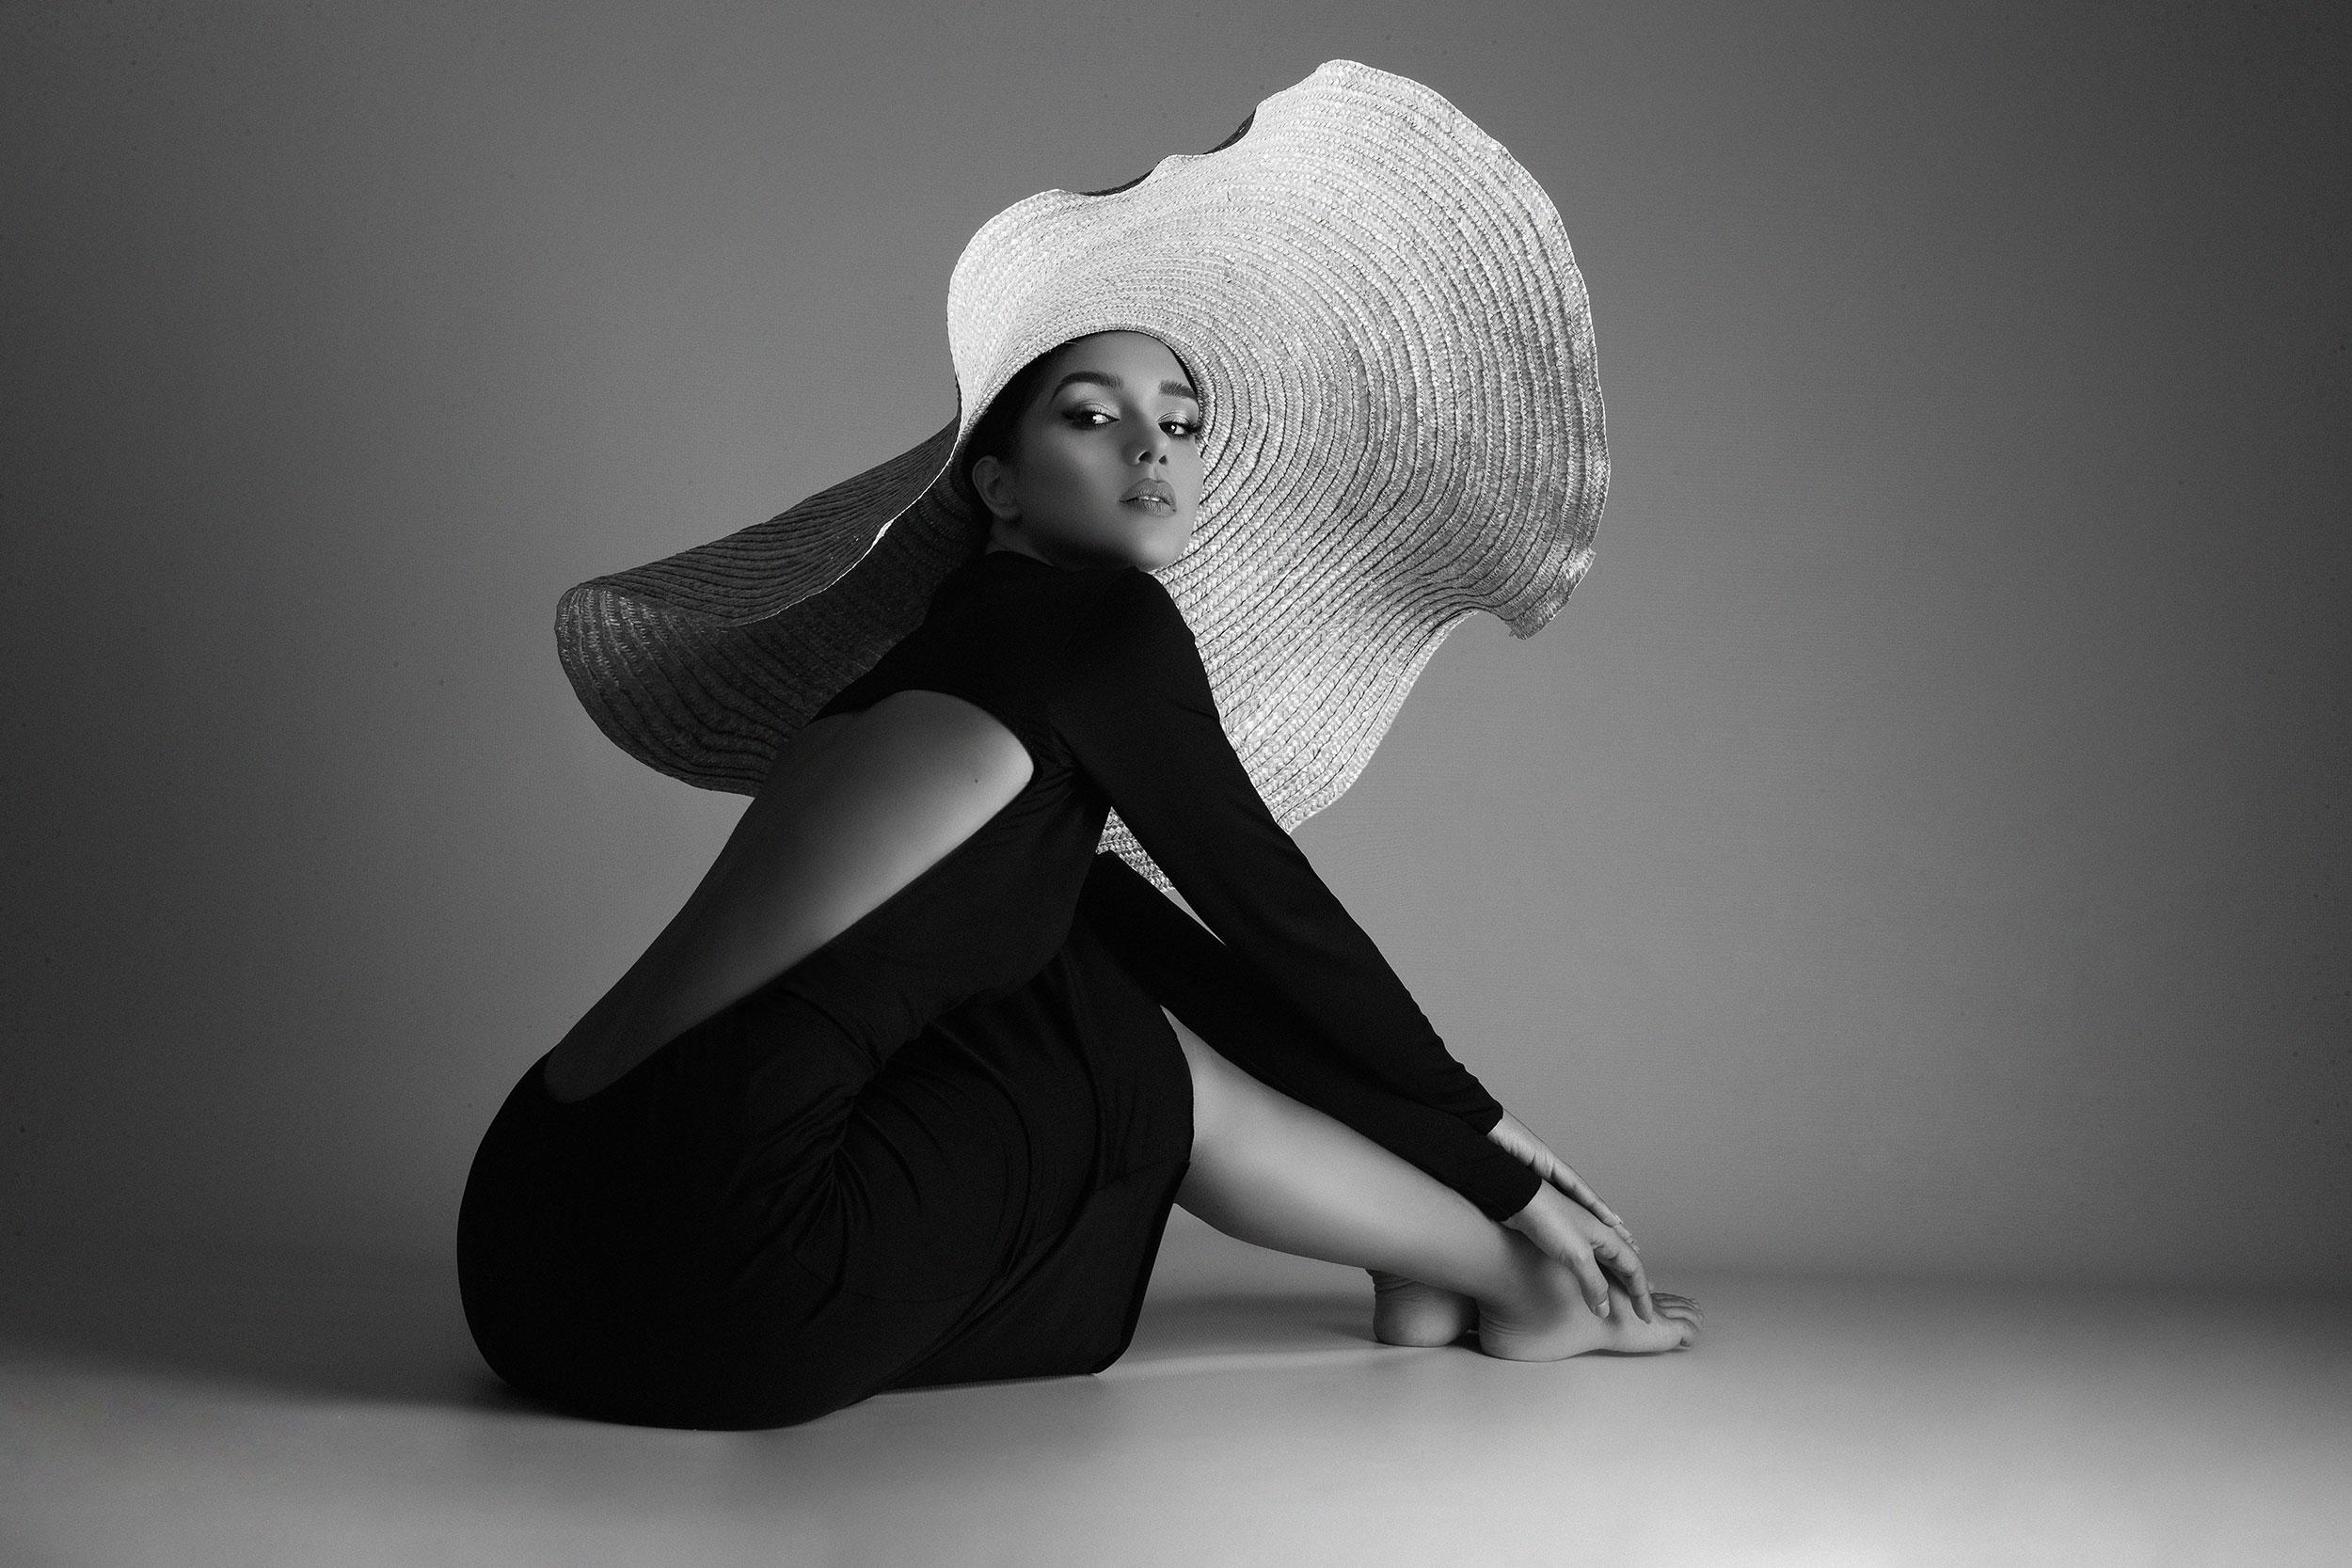 Black and white studio photos Nevina Shtylla